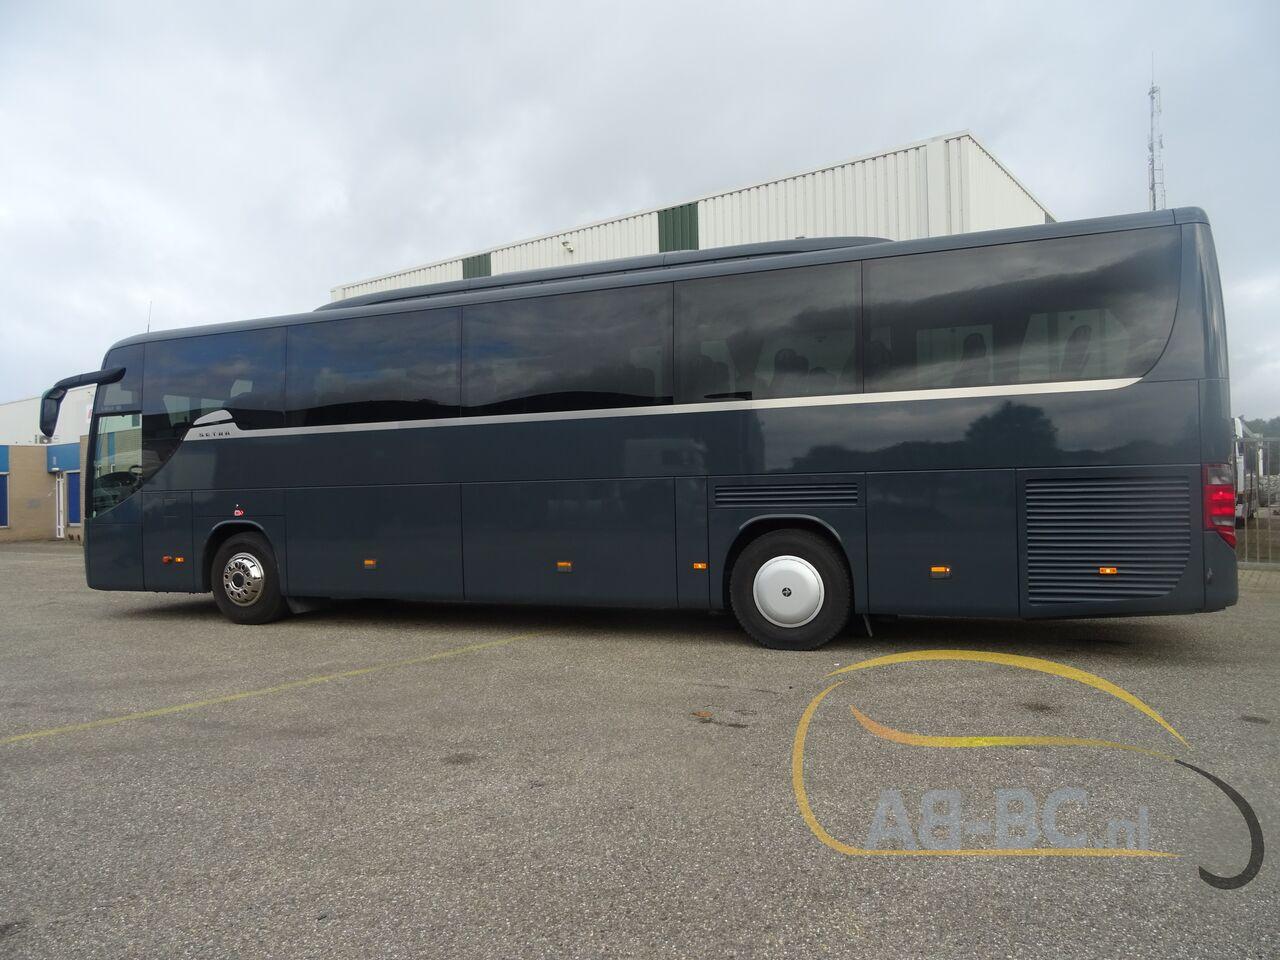 coach-busSETRA-S415-GT-HD-FINAL-EDITION---1627457011105259799_big_474cec64bbe2c0321fa86a6bb23d2e4d--21050713010665719300